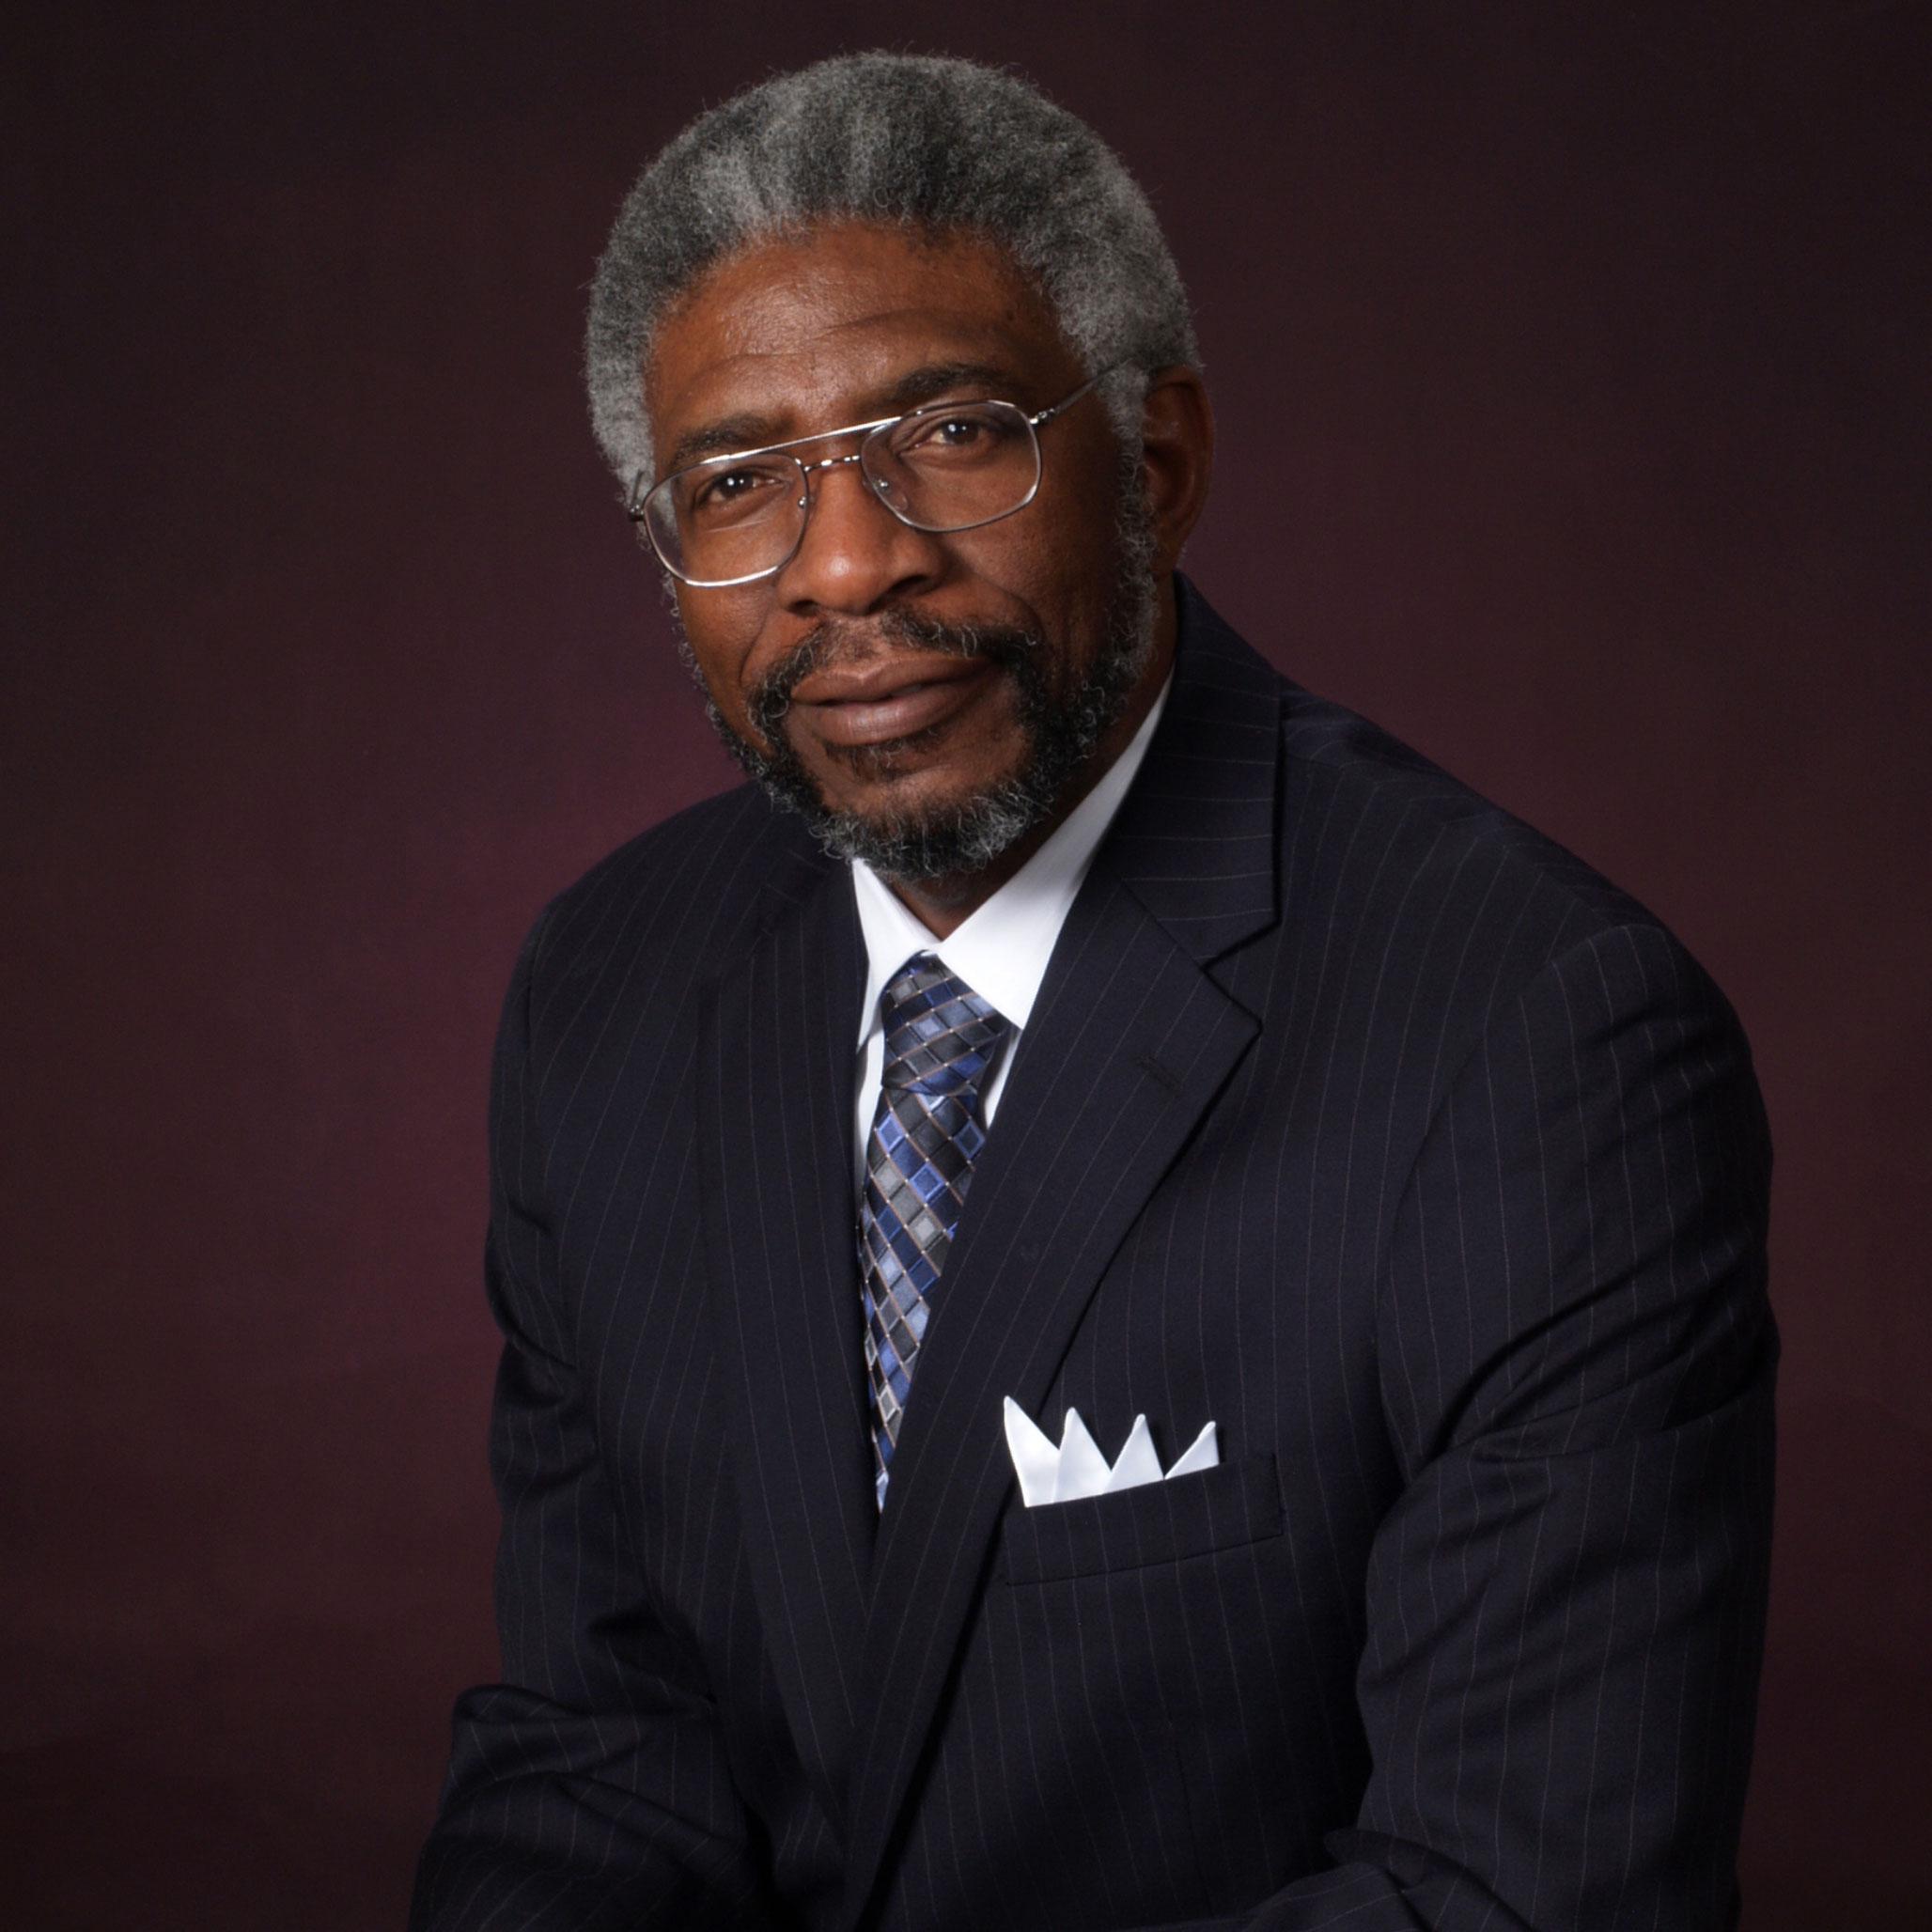 Tommy E. Smith, Pastor, Palma Ceia Baptist Church